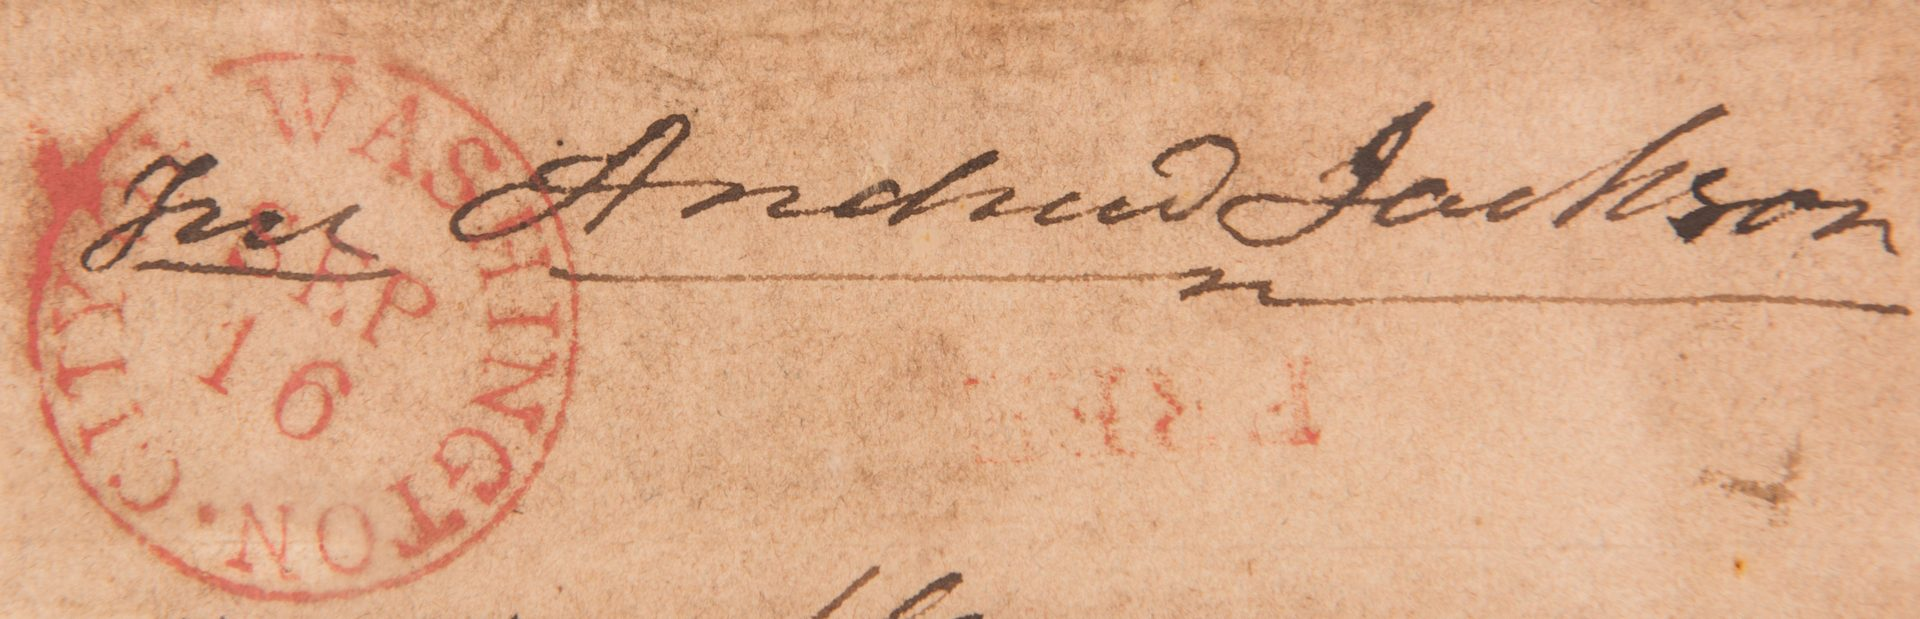 Lot 254: A. Jackson and Van Buren Correspondence to John Overton of TN, inc. Jackson Free Frank